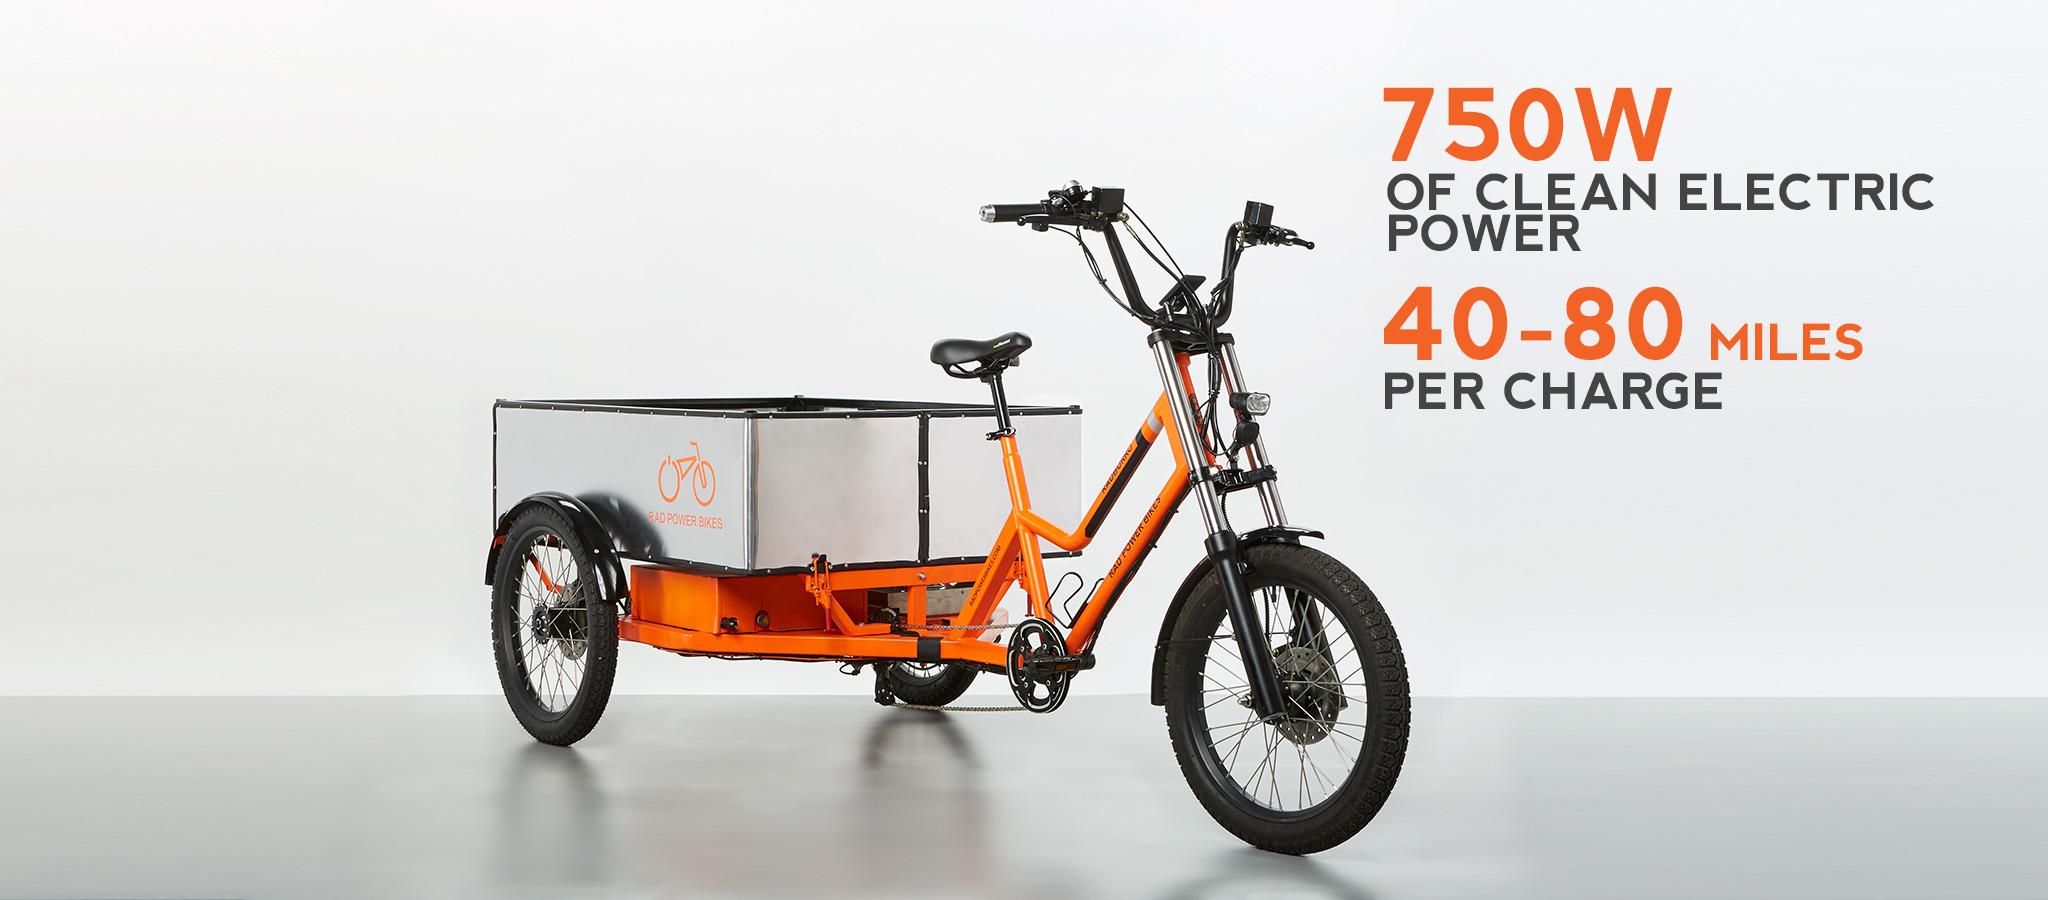 radburro rad power bikes commercial. Black Bedroom Furniture Sets. Home Design Ideas